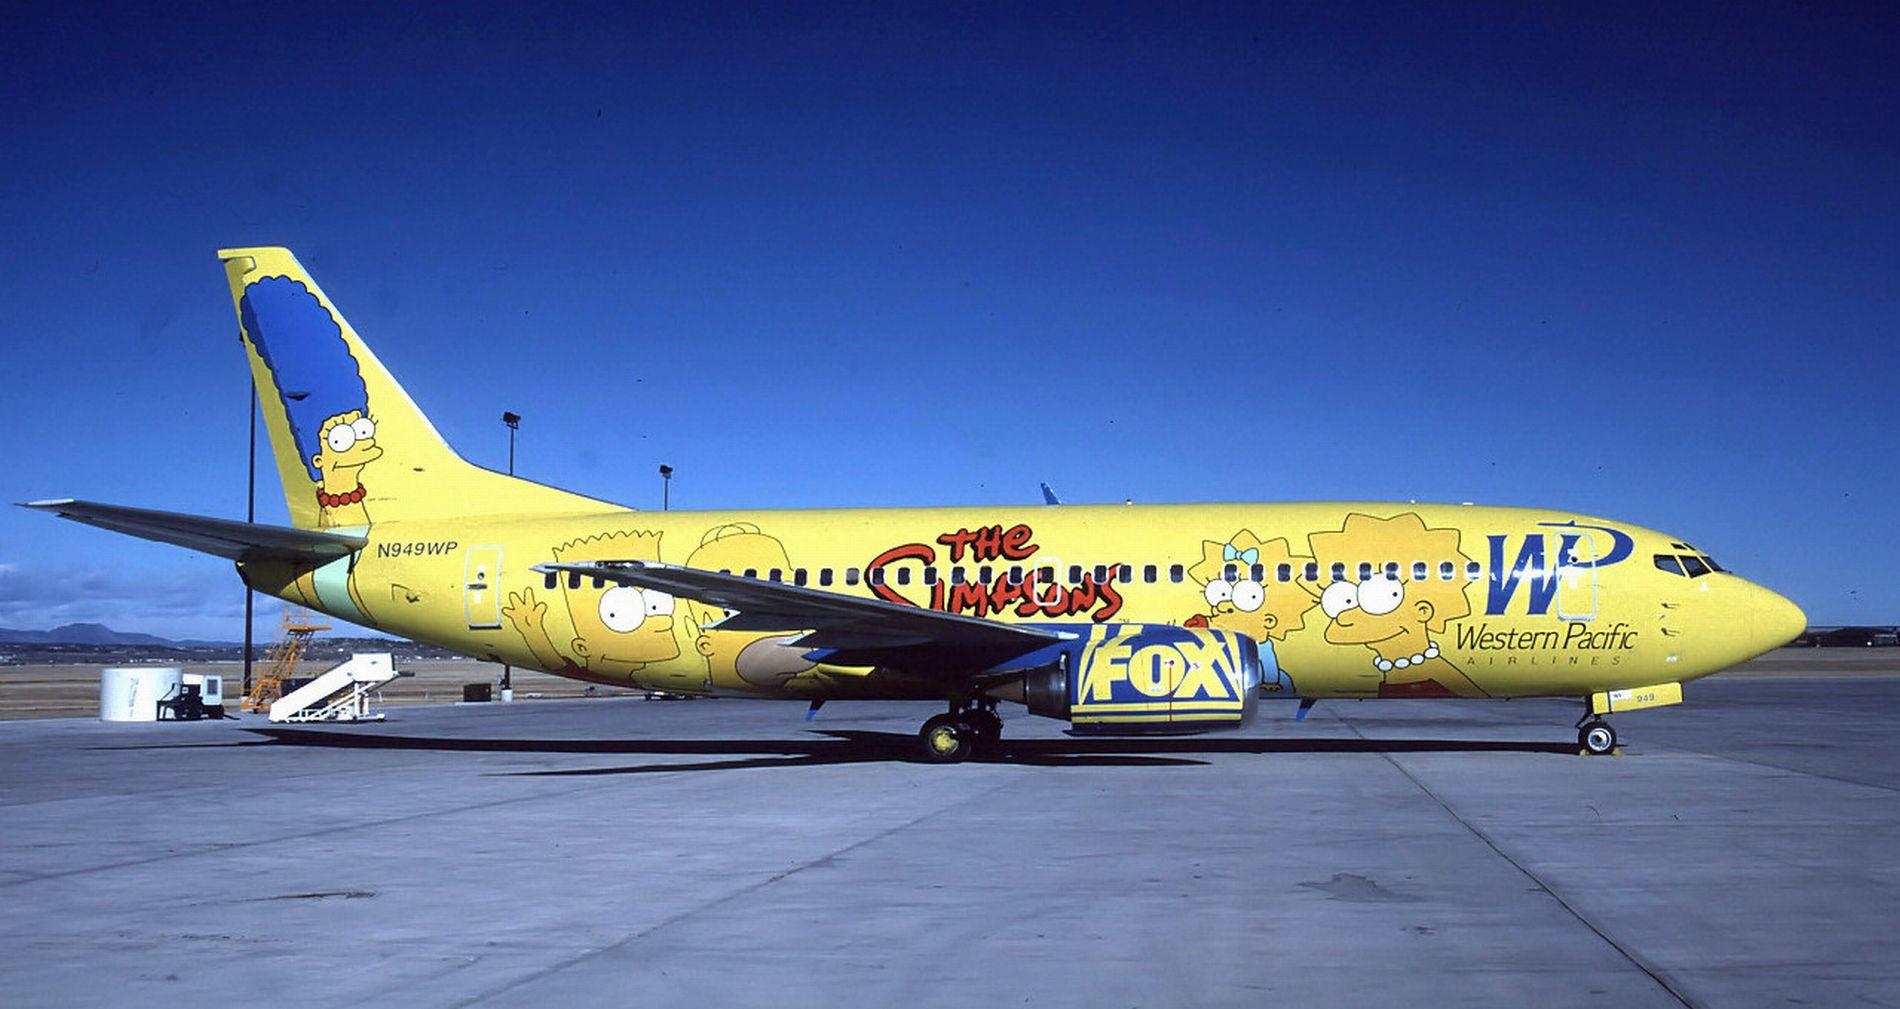 Weatern Pacific 737.jpg